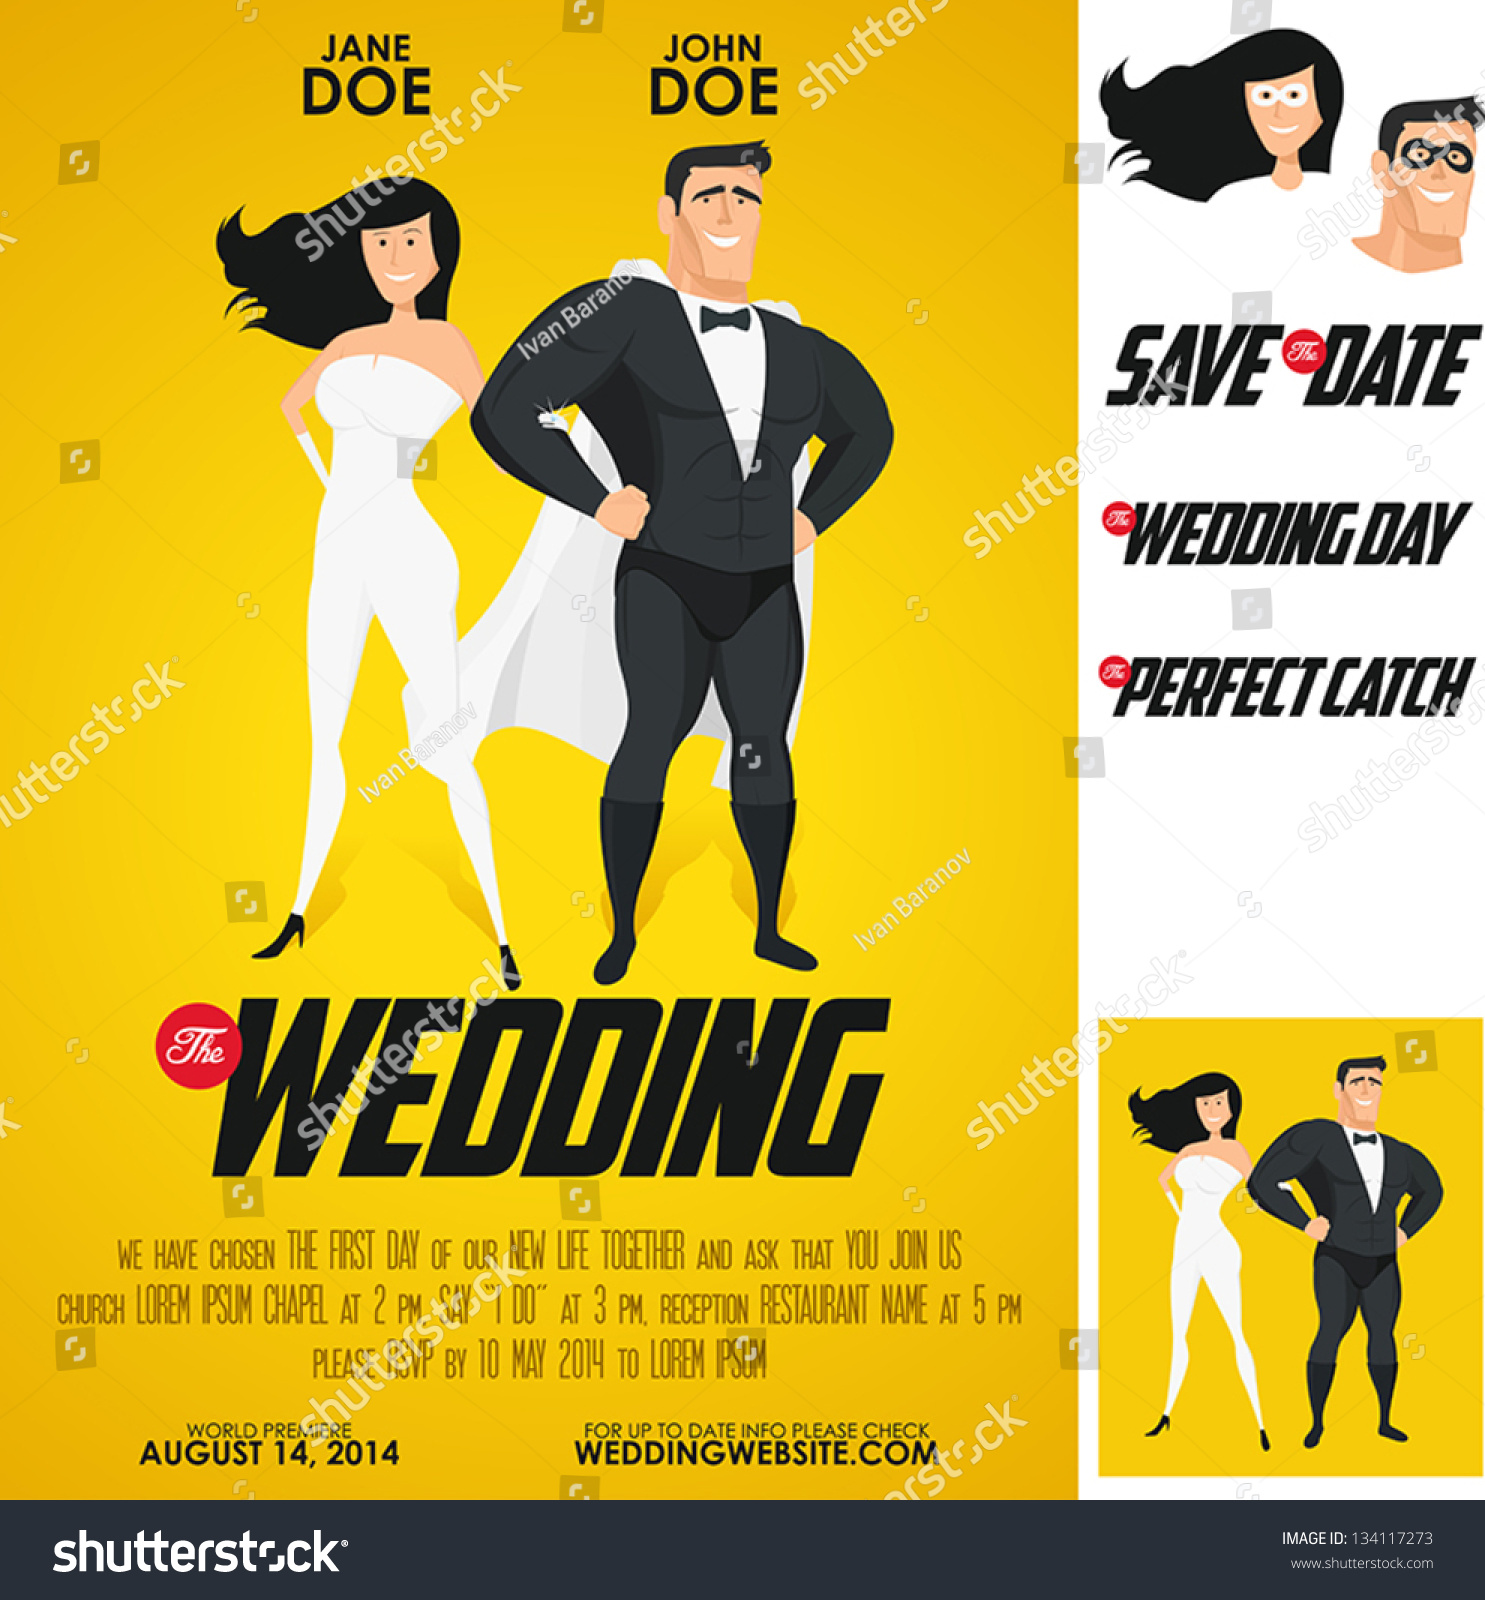 Funny Super Hero Movie Poster Wedding Invitation. No